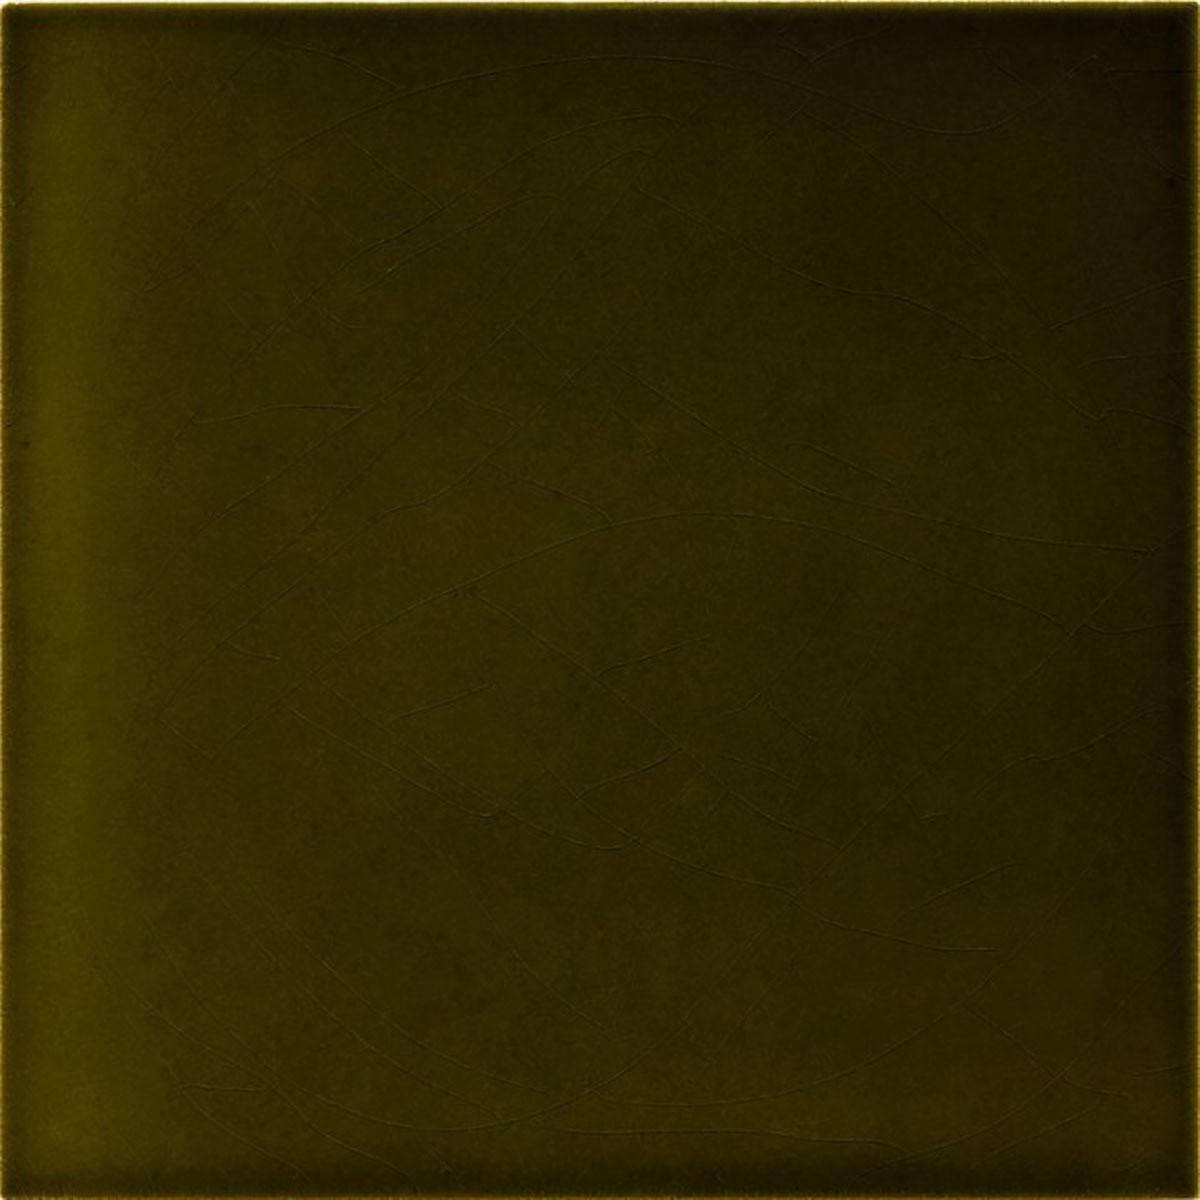 Olive Green Wall: »Wall Tile Art Nouveau Olive Green« Von Replicata